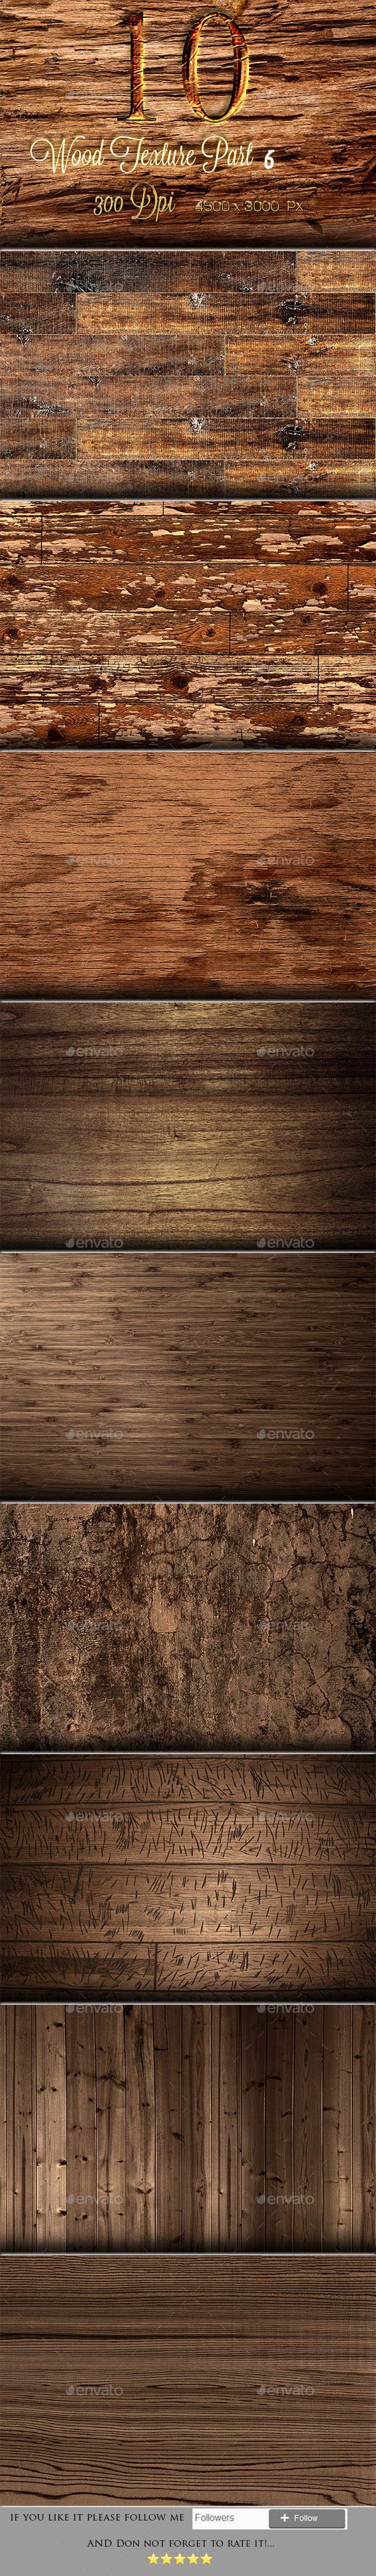 10 wood texture part 6 - Textures